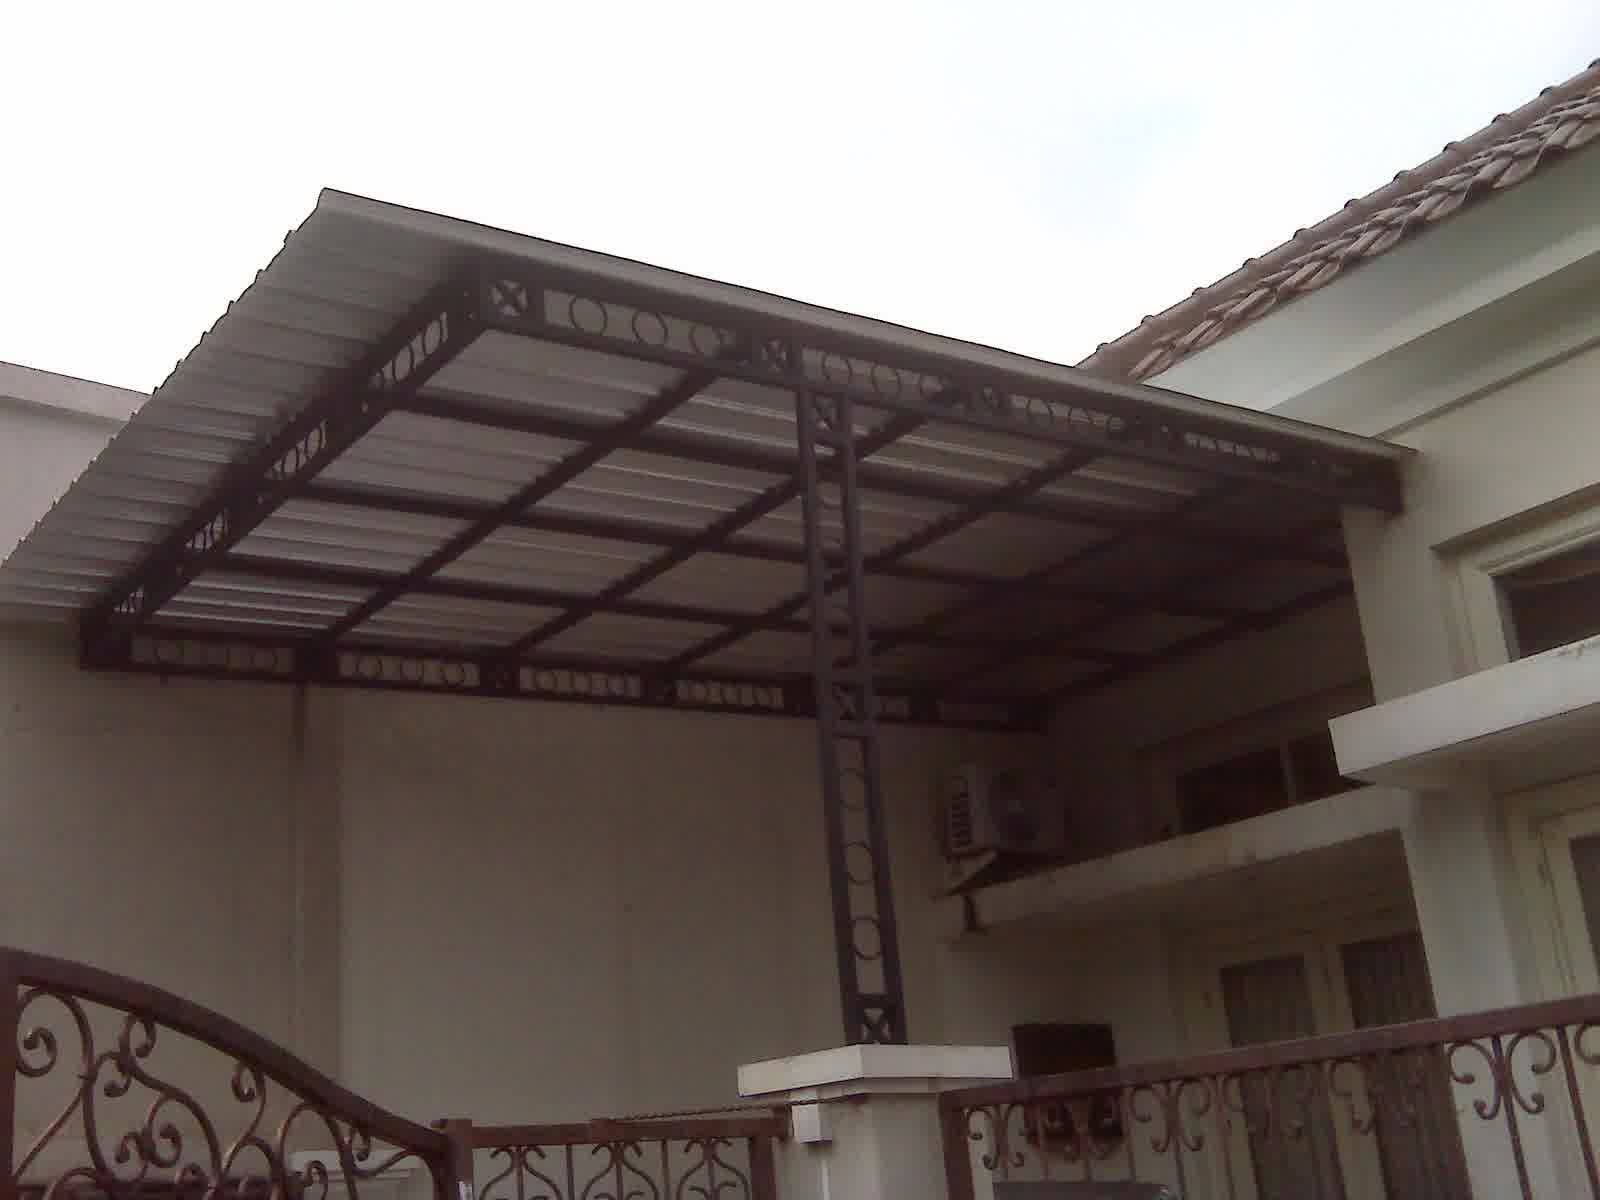 Jasa  Pembuatan   Langit  Baja Ringan  Gorontalo Utara